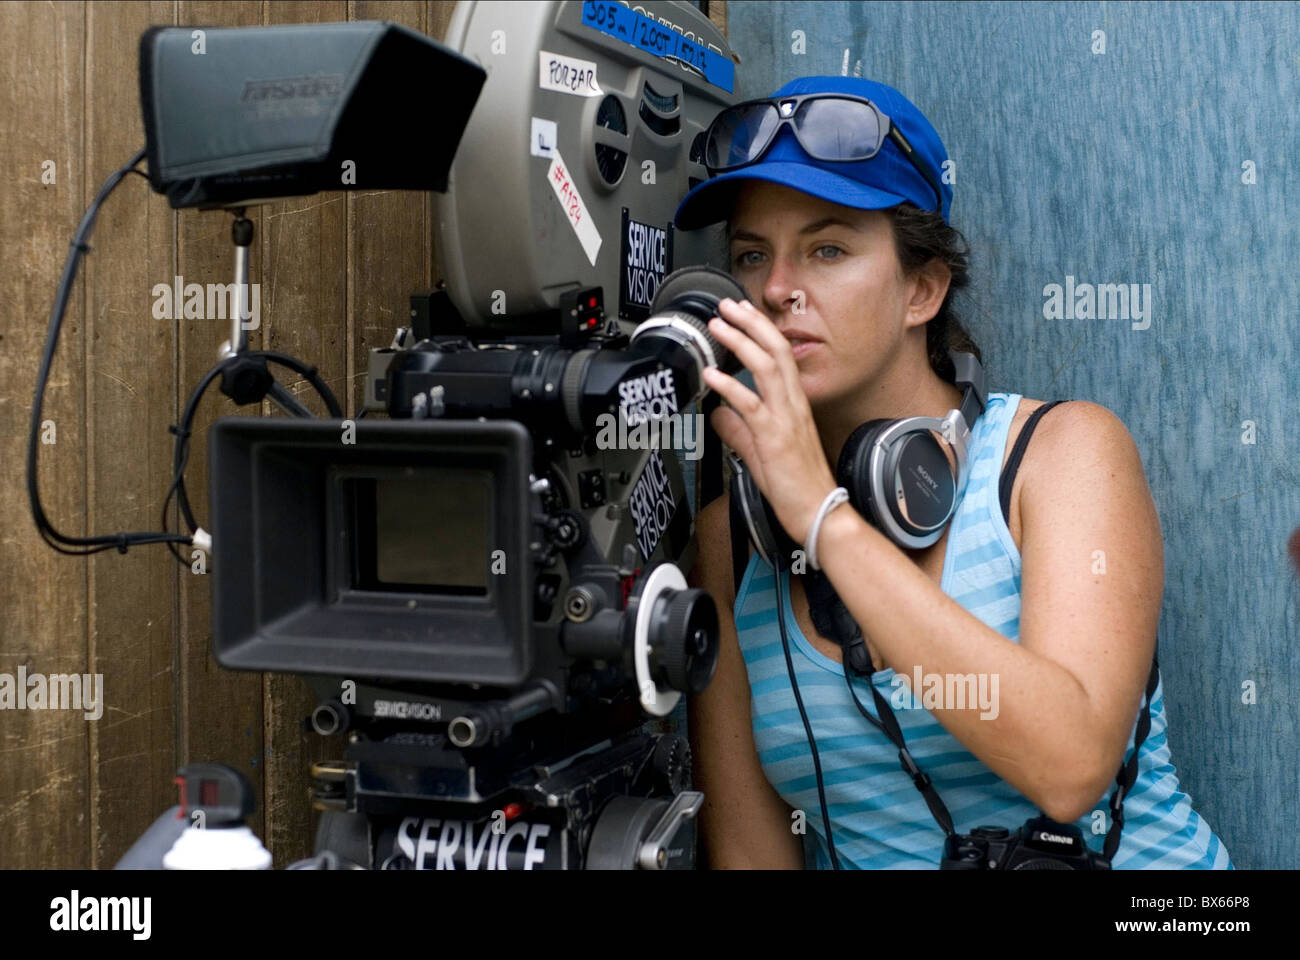 CLAUDIA LLOSA LA TETA ASUSTADA ; THE MILK OF SORROW (2009) - Stock Image